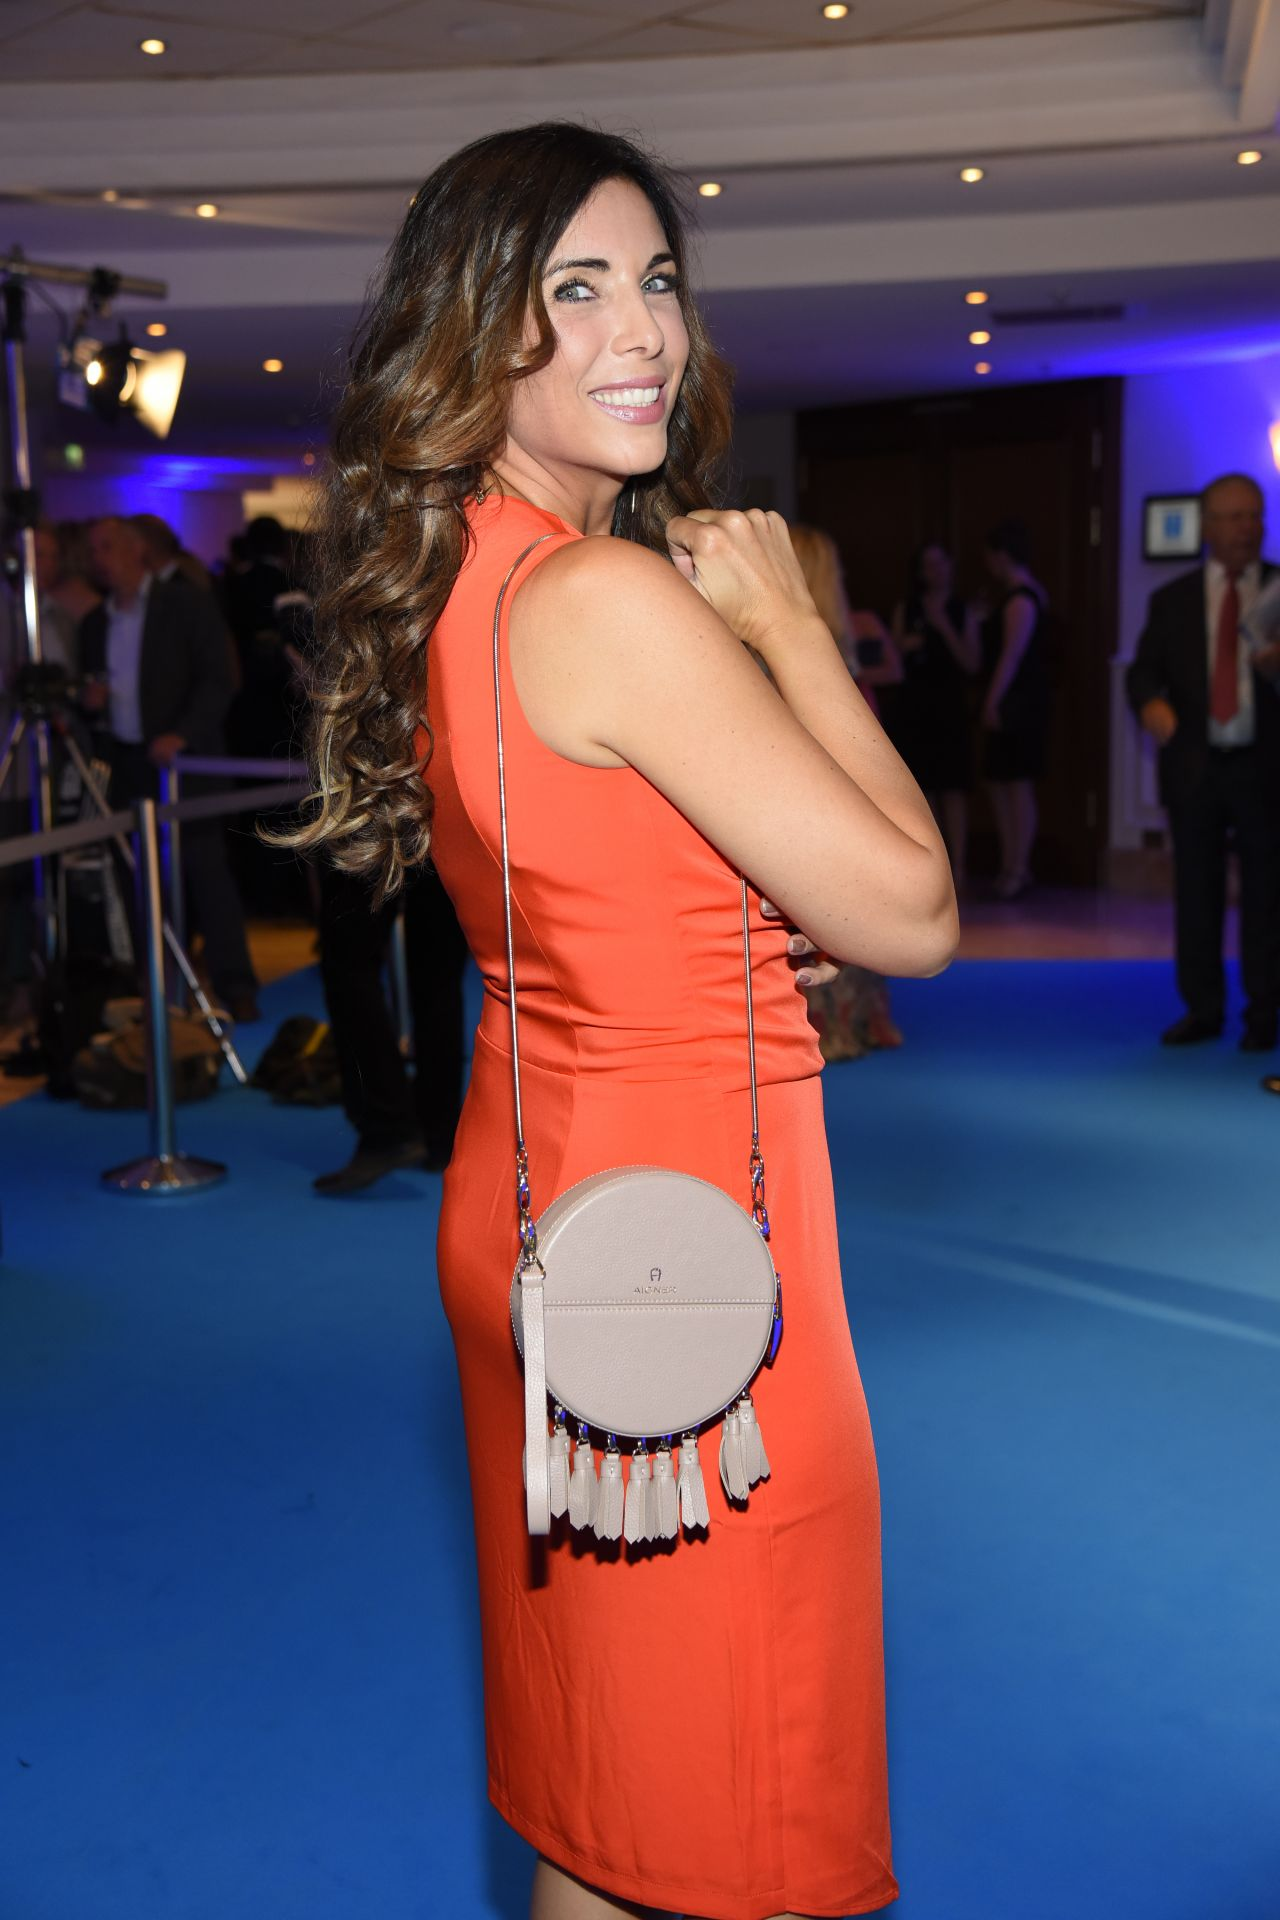 Alexandra polzin spa diamond award 2019 in hotel palace berlin nude (62 pictures)